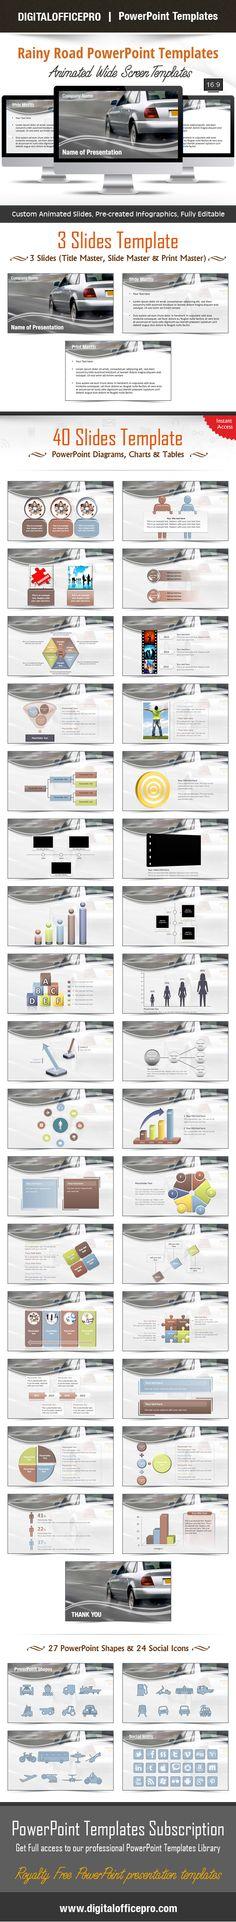 Big bundle v2 business powerpoint templates template and big bundle v2 business powerpoint templates template and powerpoint presentation templates toneelgroepblik Image collections